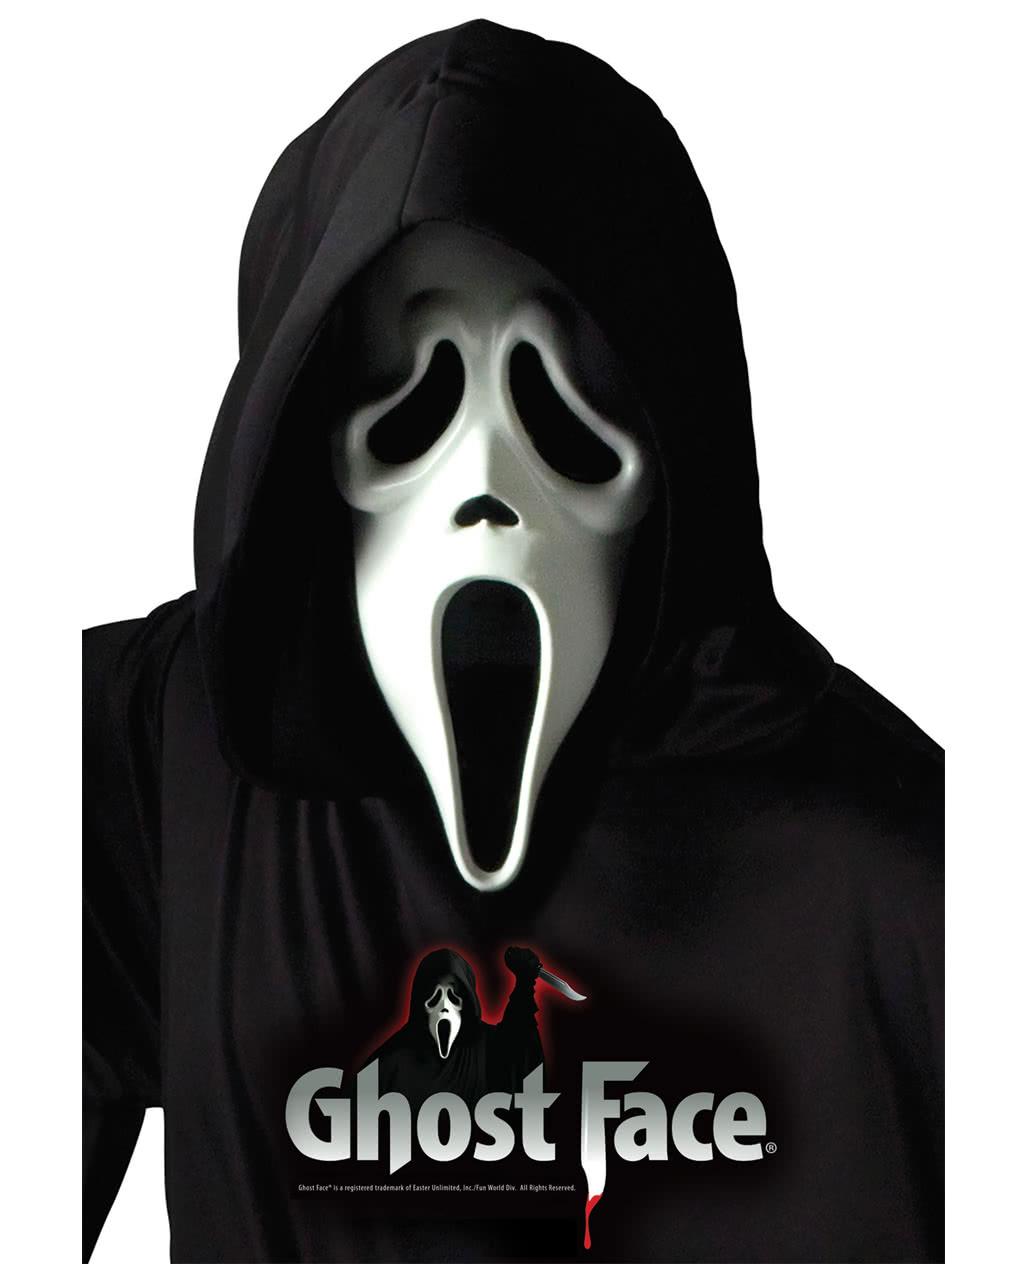 Original Scream Maske Ghost Face Maske Von Wes Craven Horror